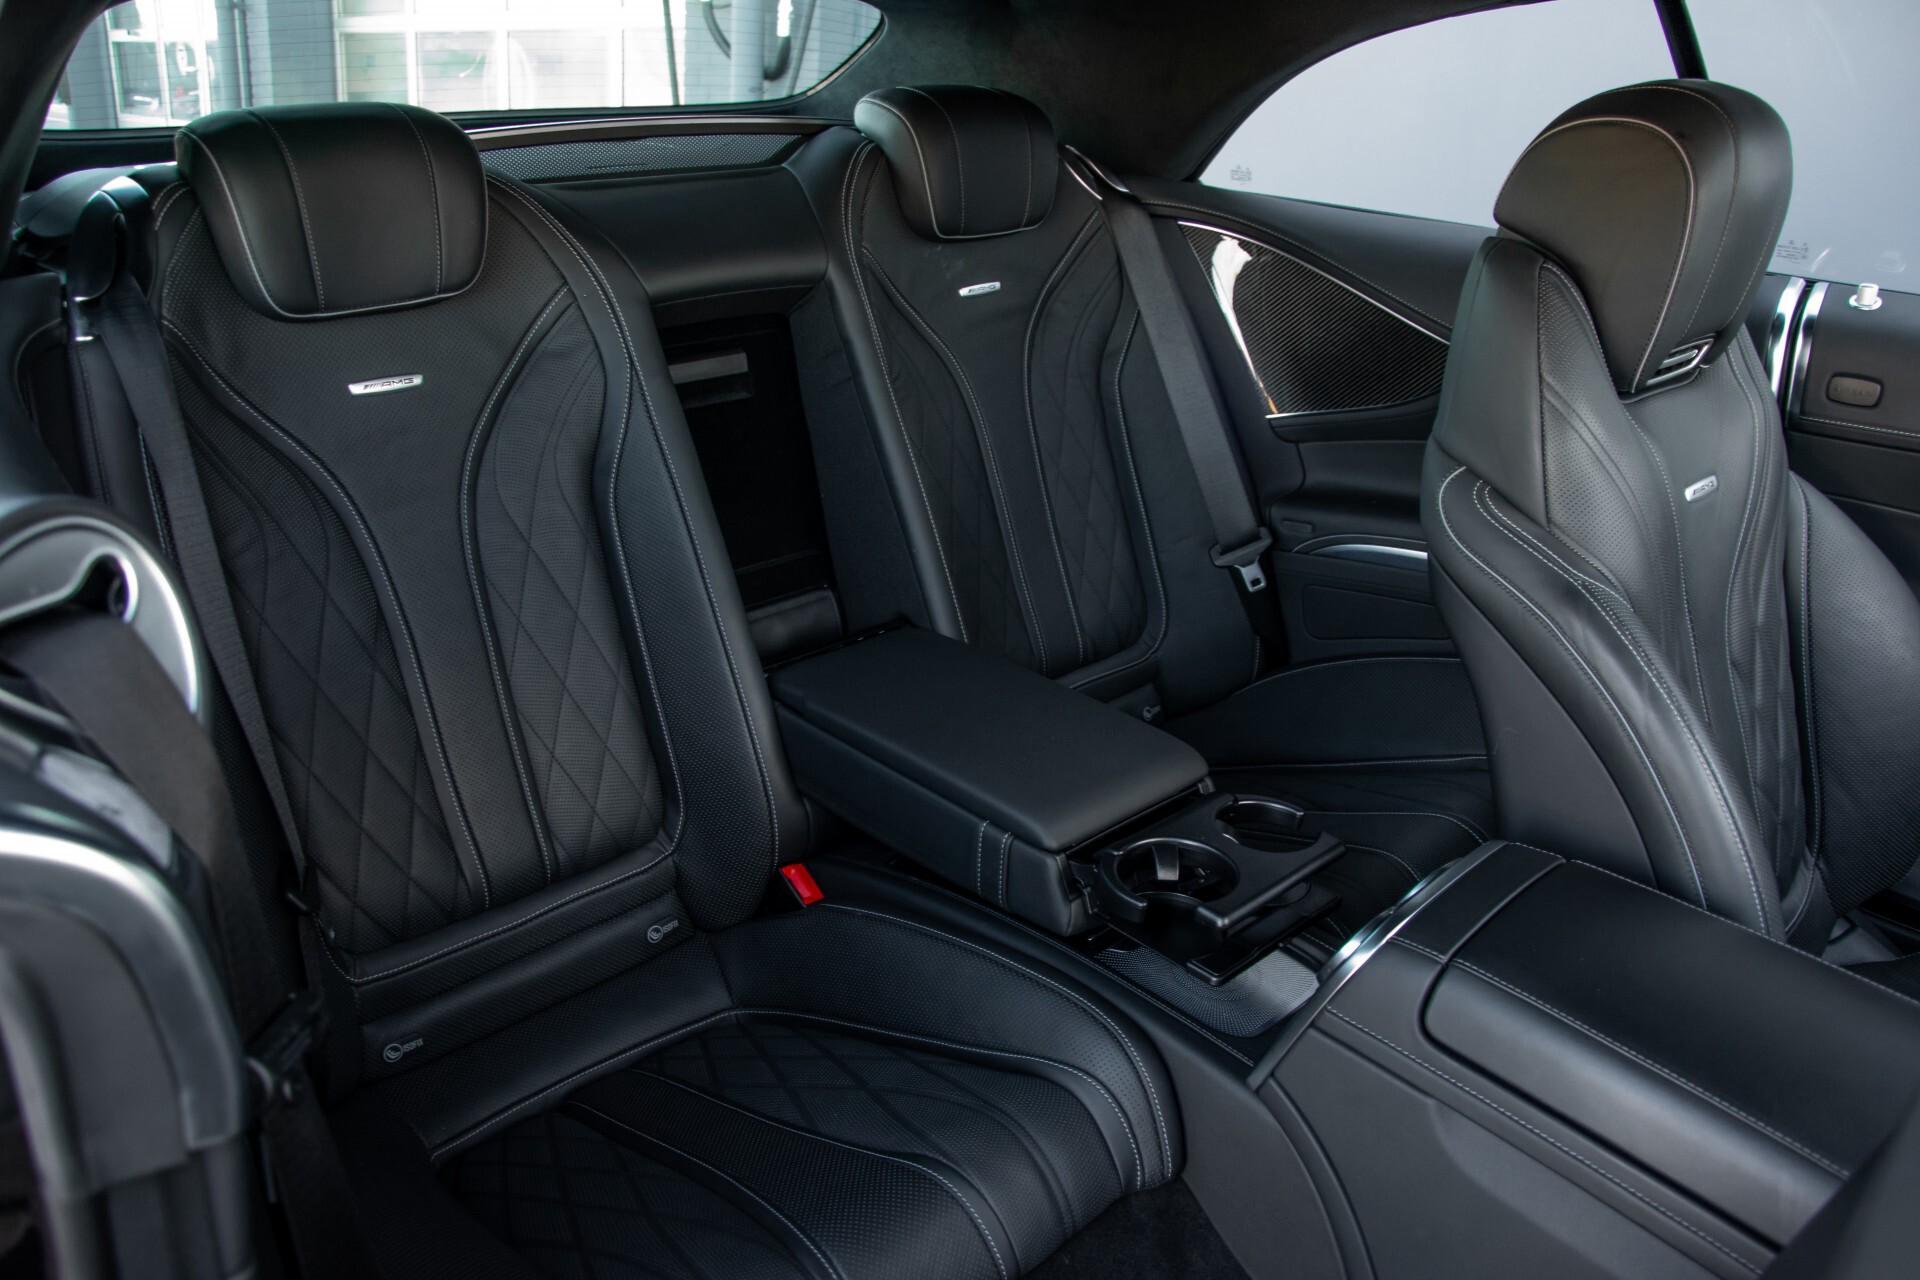 Mercedes-Benz S-Klasse Cabrio 63 AMG 4M+ Keramisch/Burmester High End 3D/Carbon/Driverspack/Blackpack Aut9 Foto 7